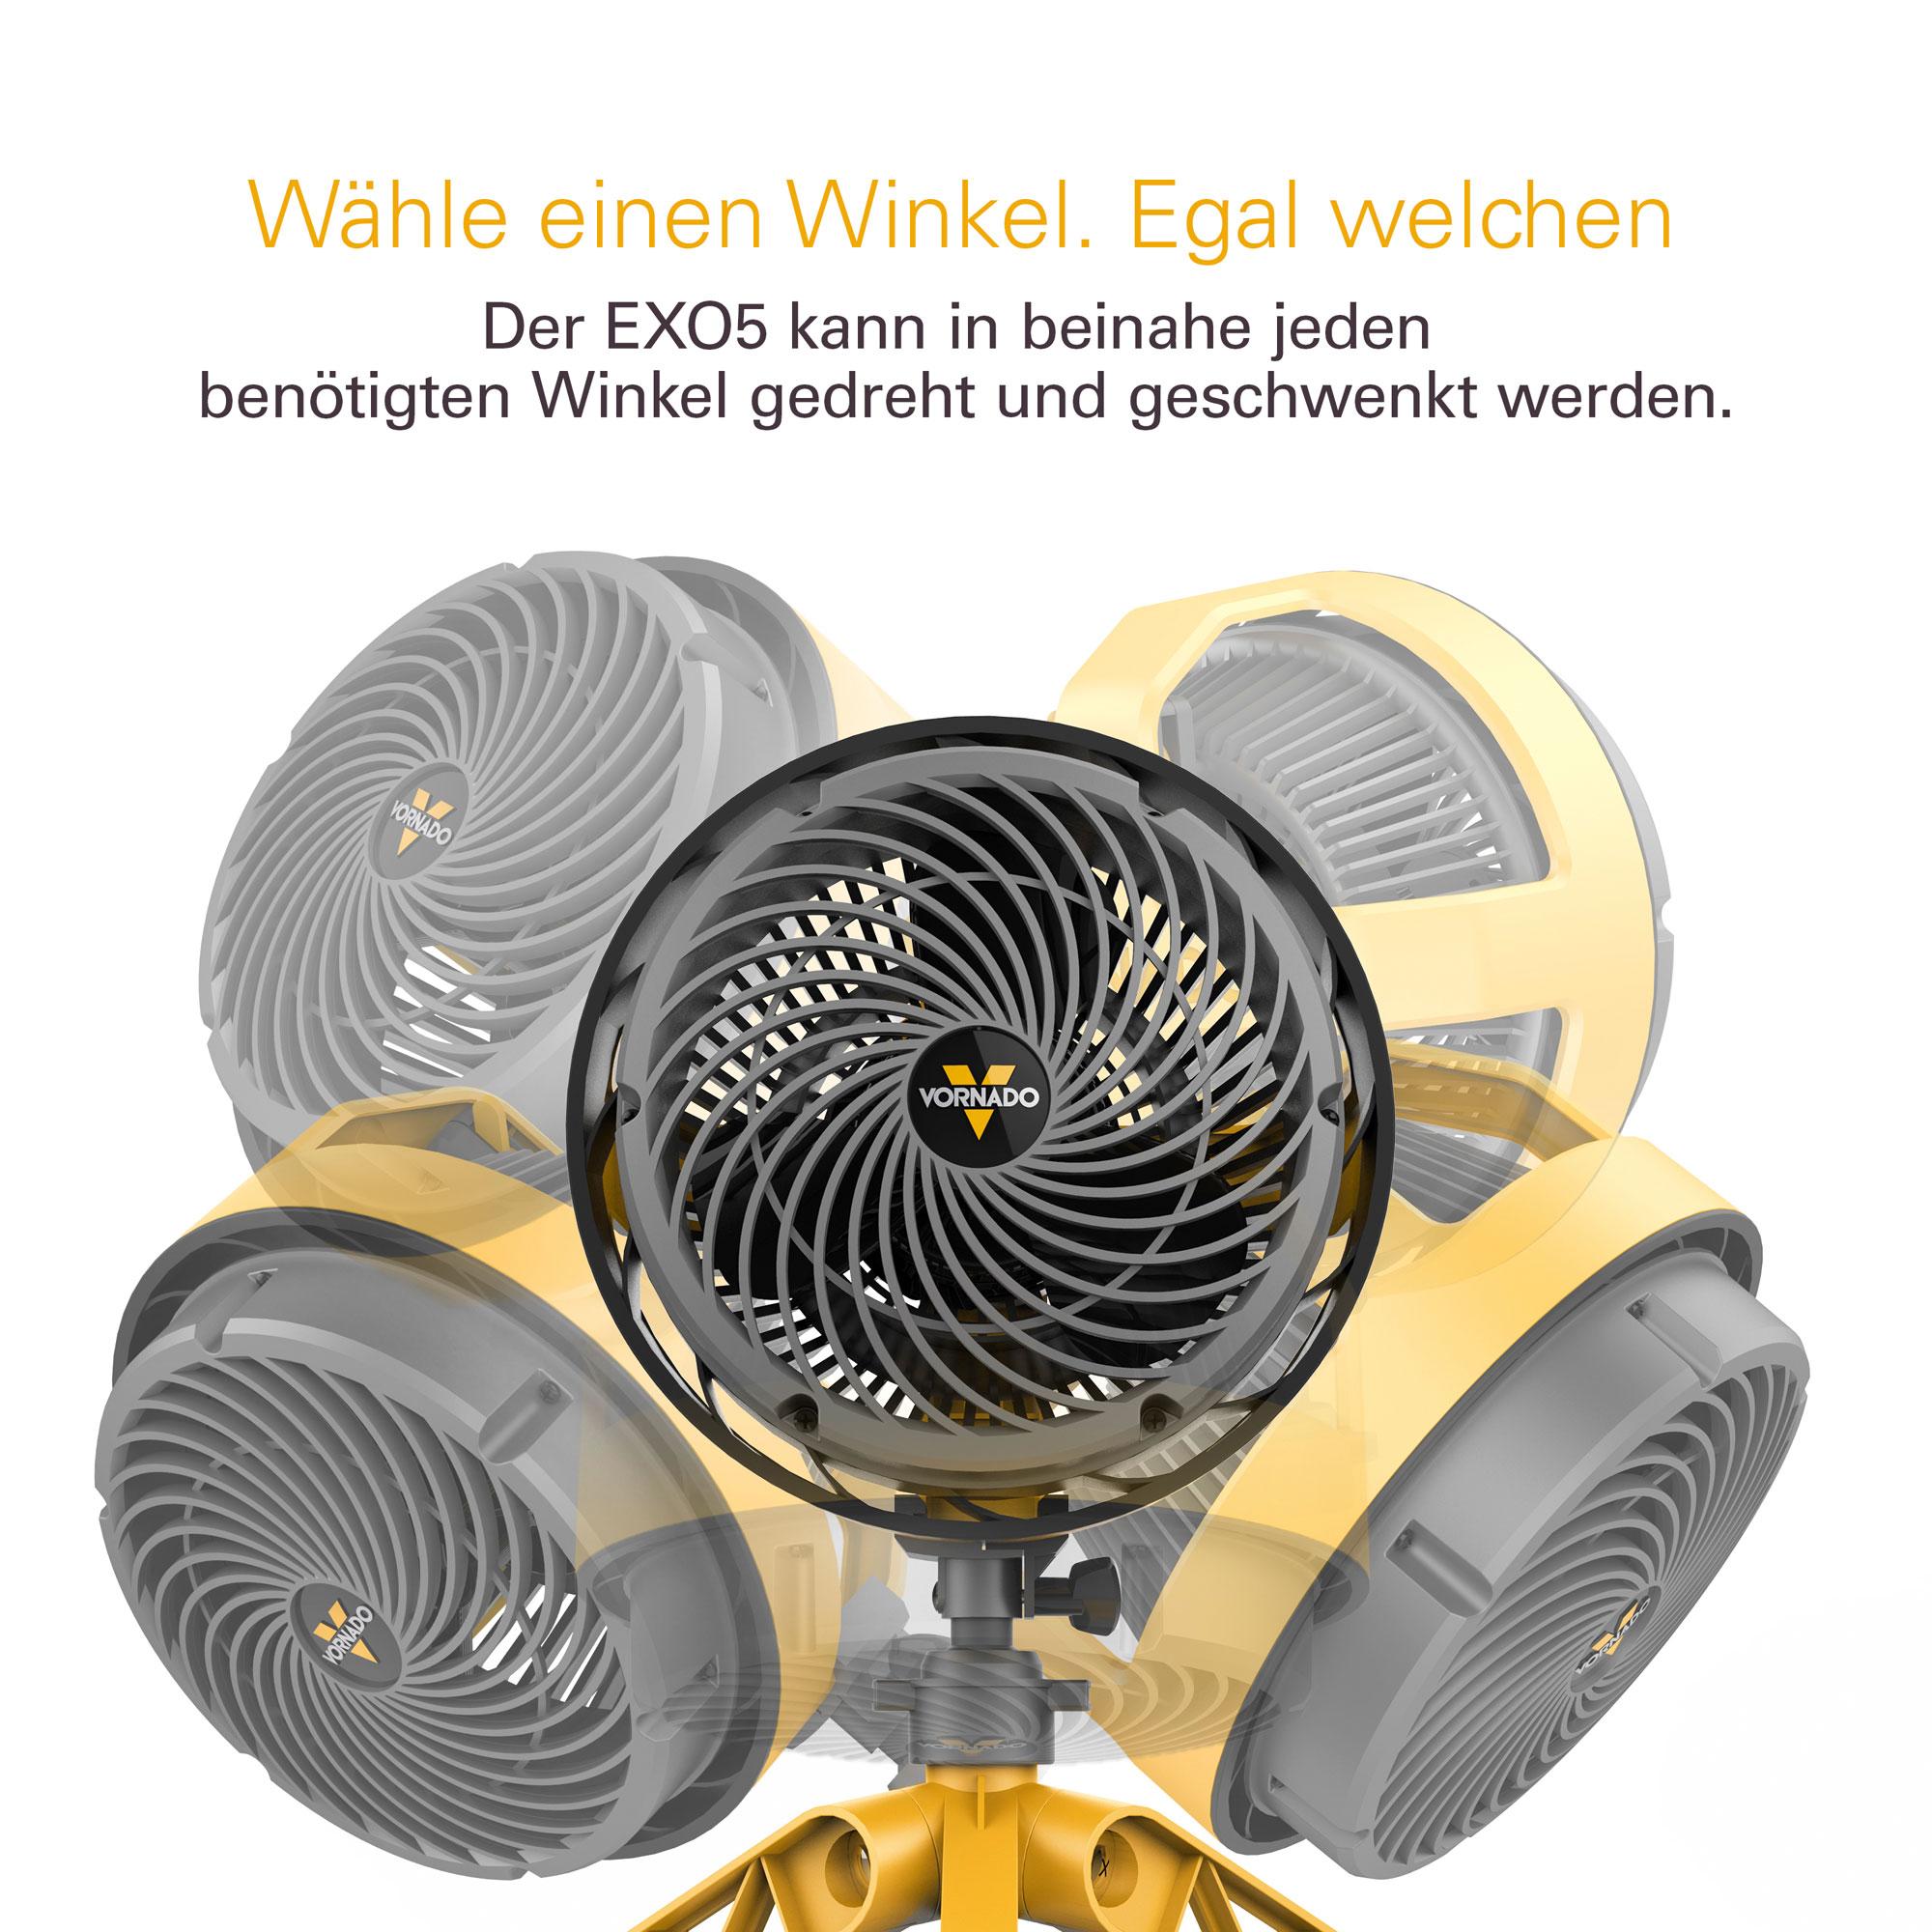 Ventilator / Zirkulator Vornado Heavy Duty EXO5 Bild 3